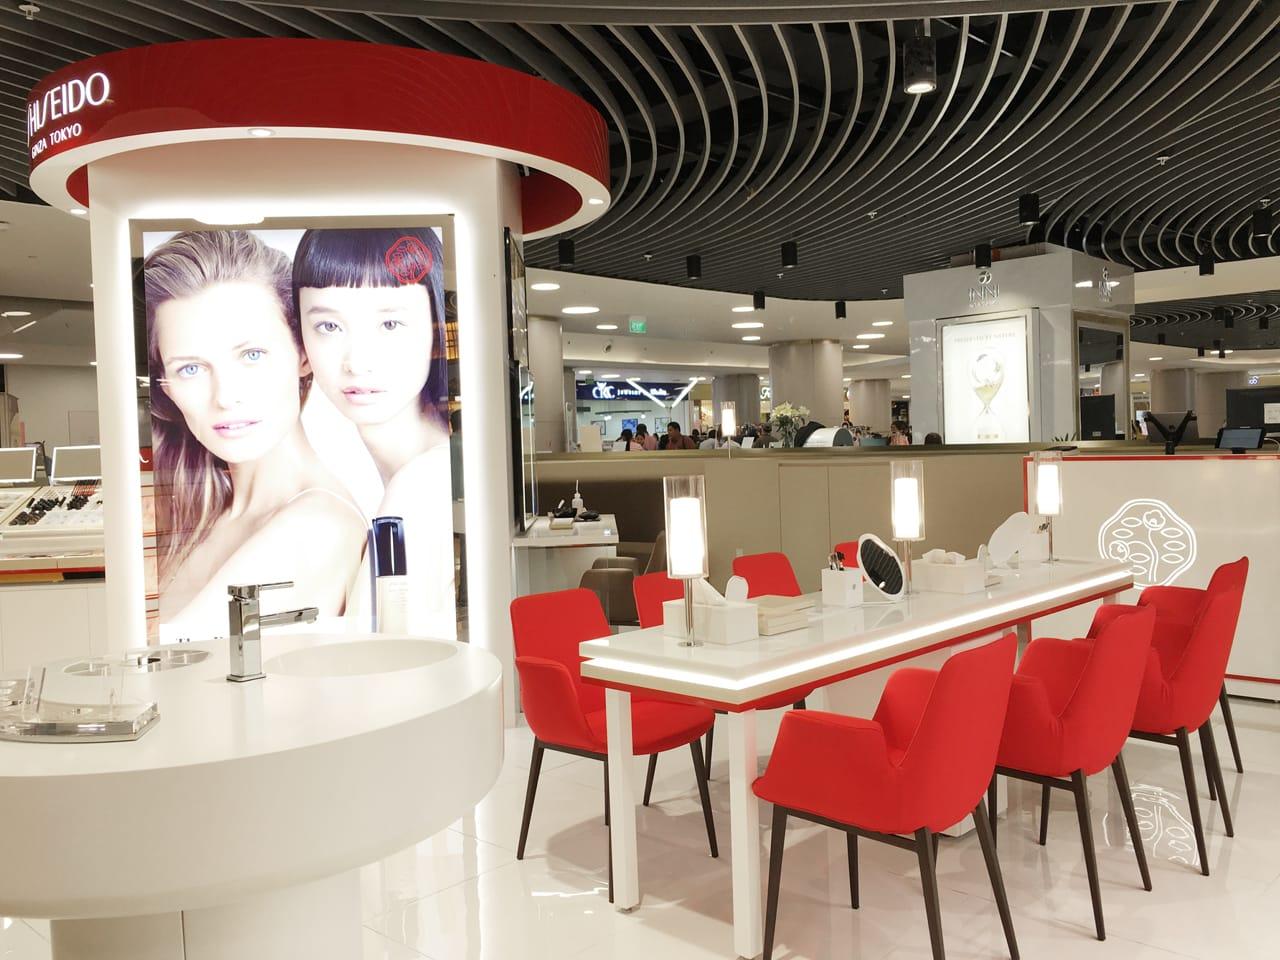 Fondue armchair comfort design the chair table people - Shiseido singapore office ...